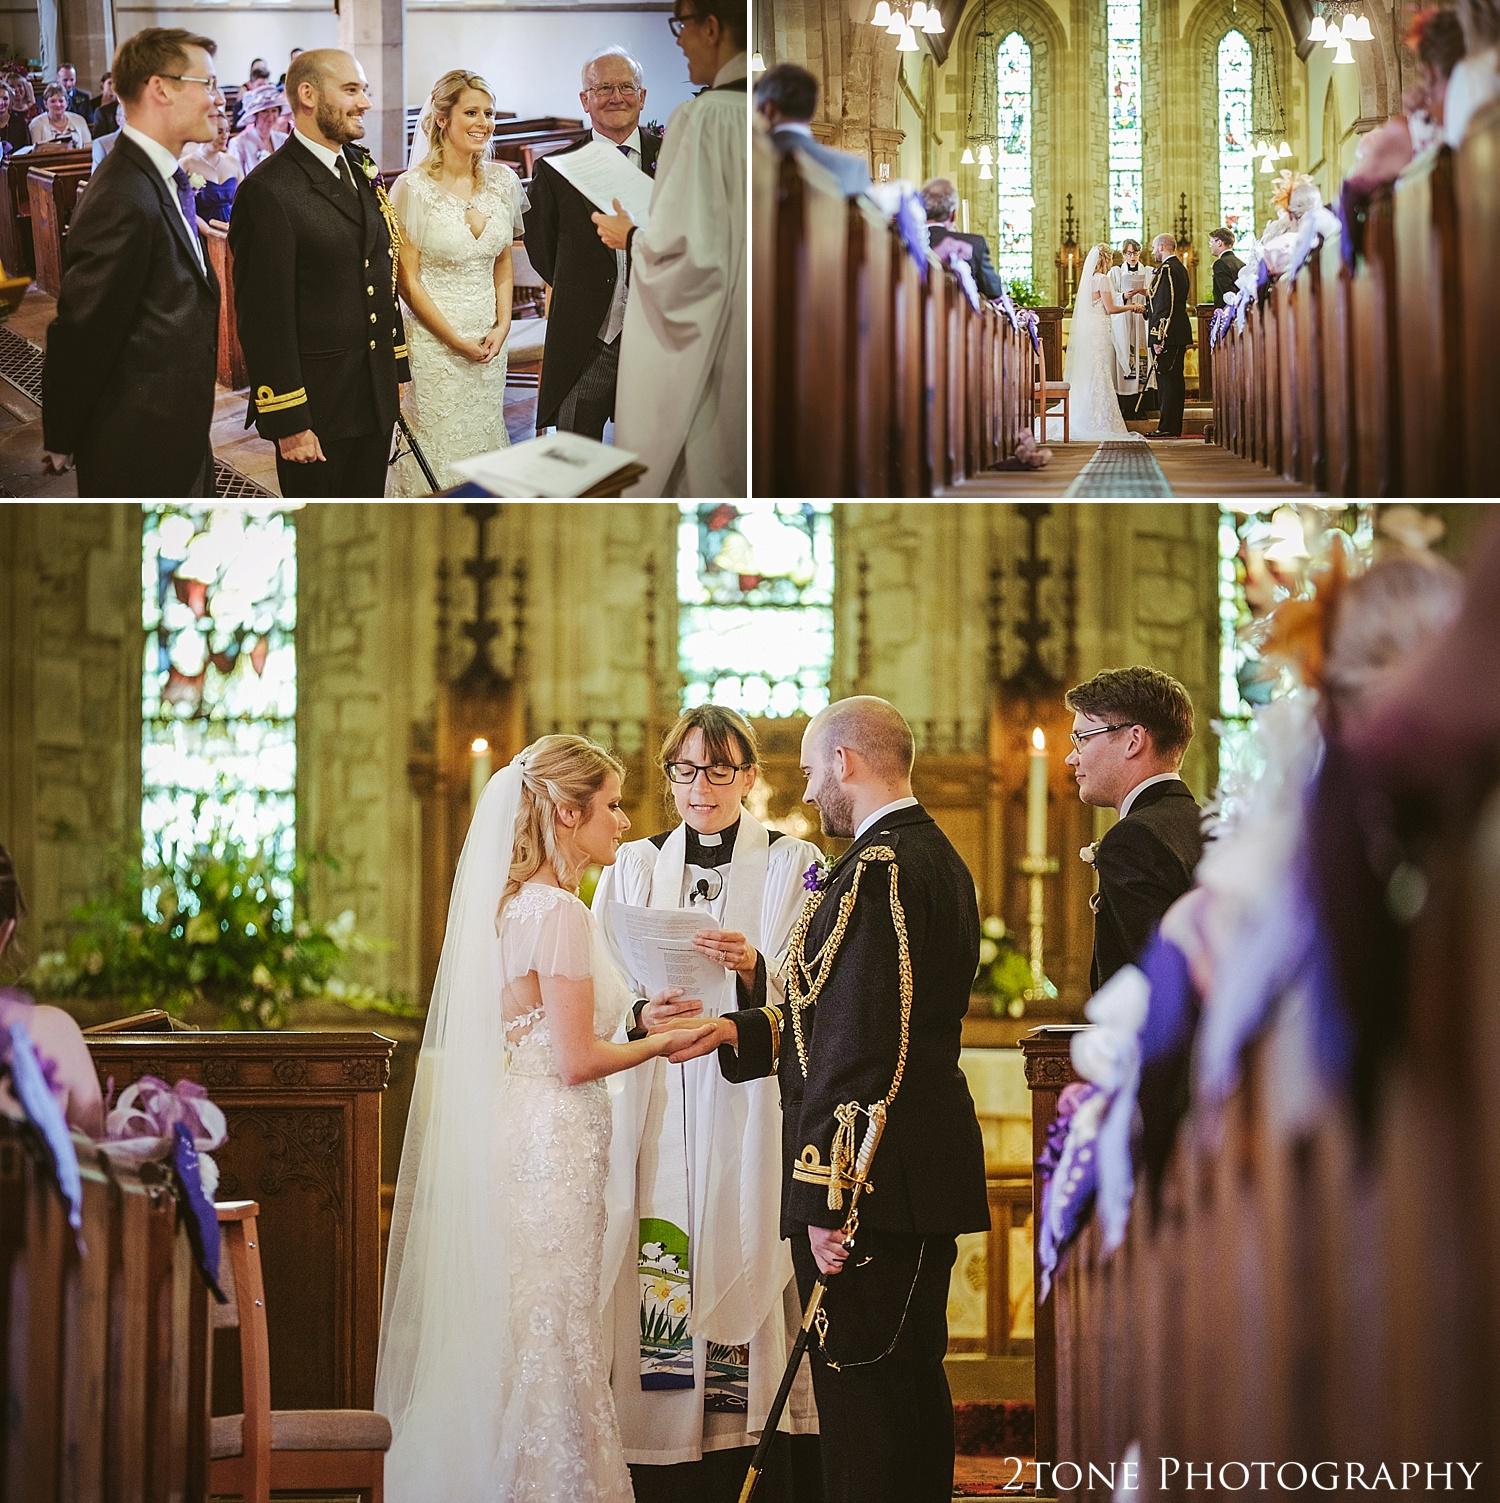 Stamfordham church wedding ceremony.  Wedding photography at Matfen Hall by wedding photographer www.2tonephotography.co.uk